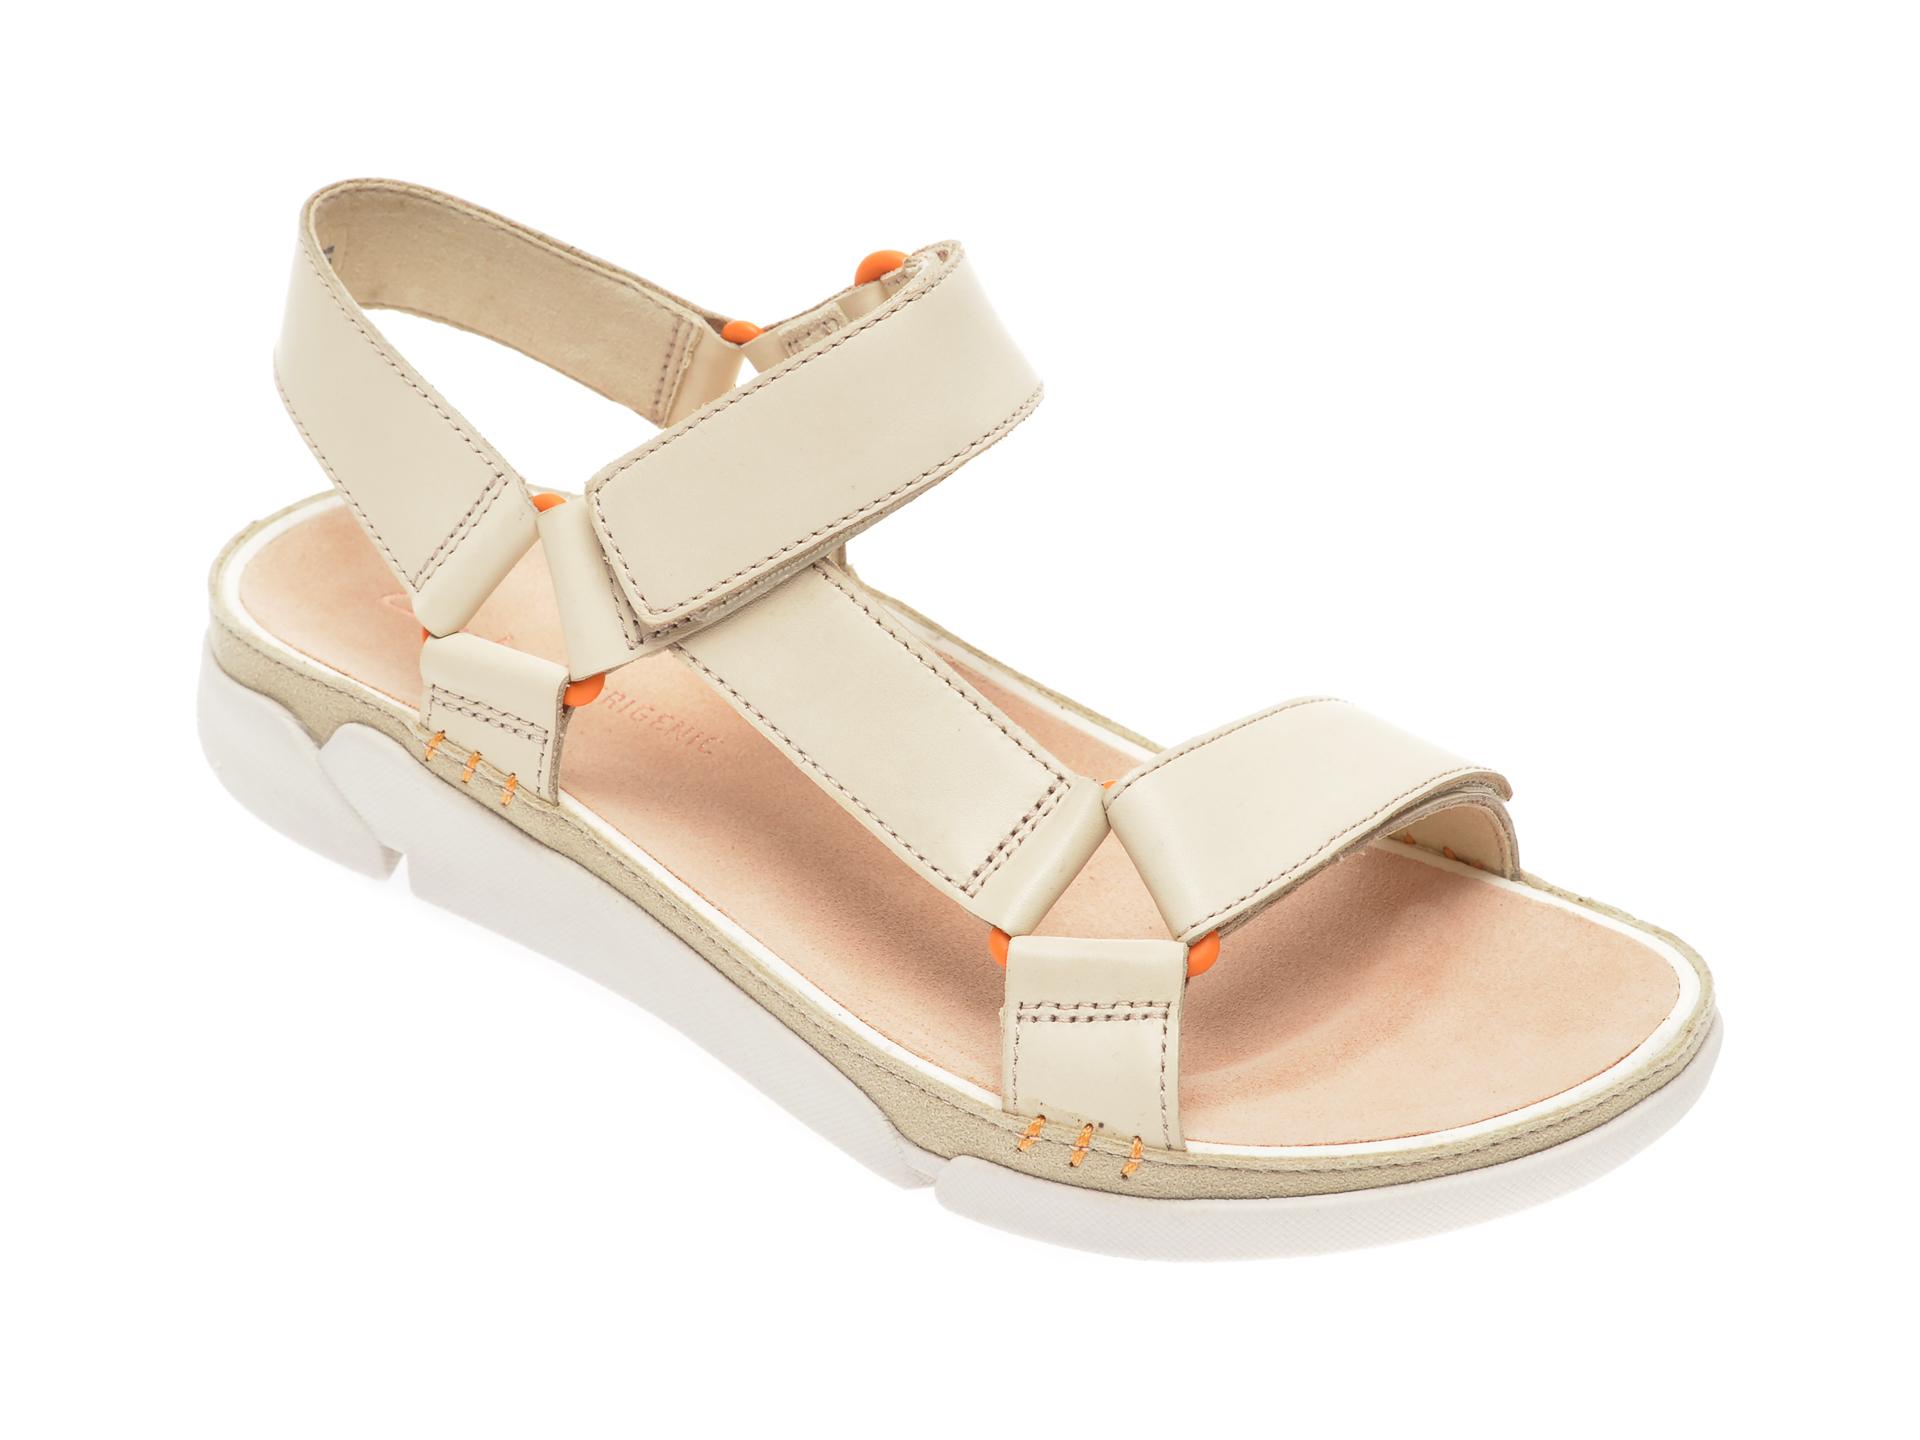 Sandale CLARKS bej, Tri Sporty, din piele naturala New